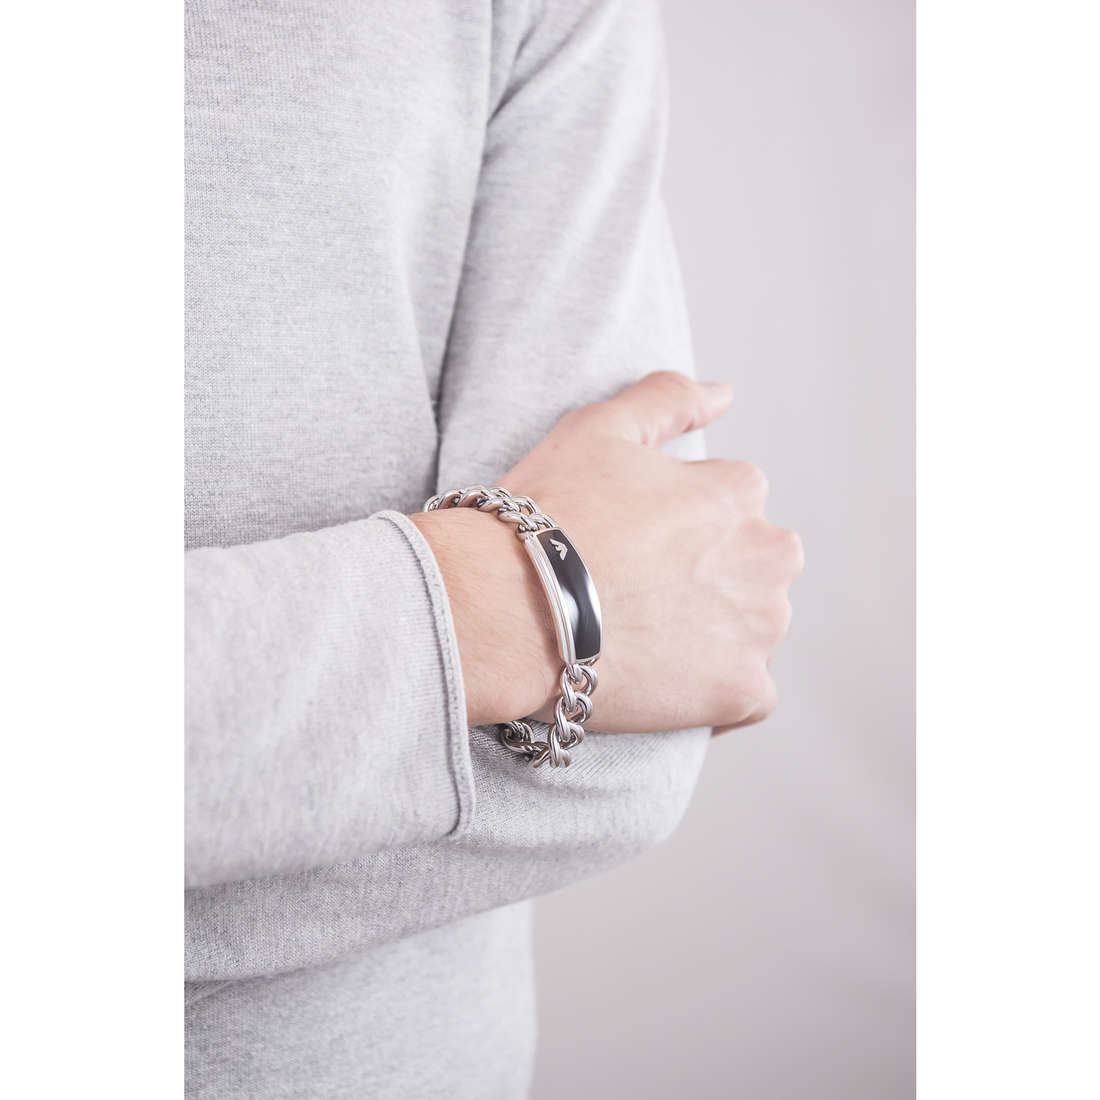 Emporio Armani bracelets man EGS172904019 indosso